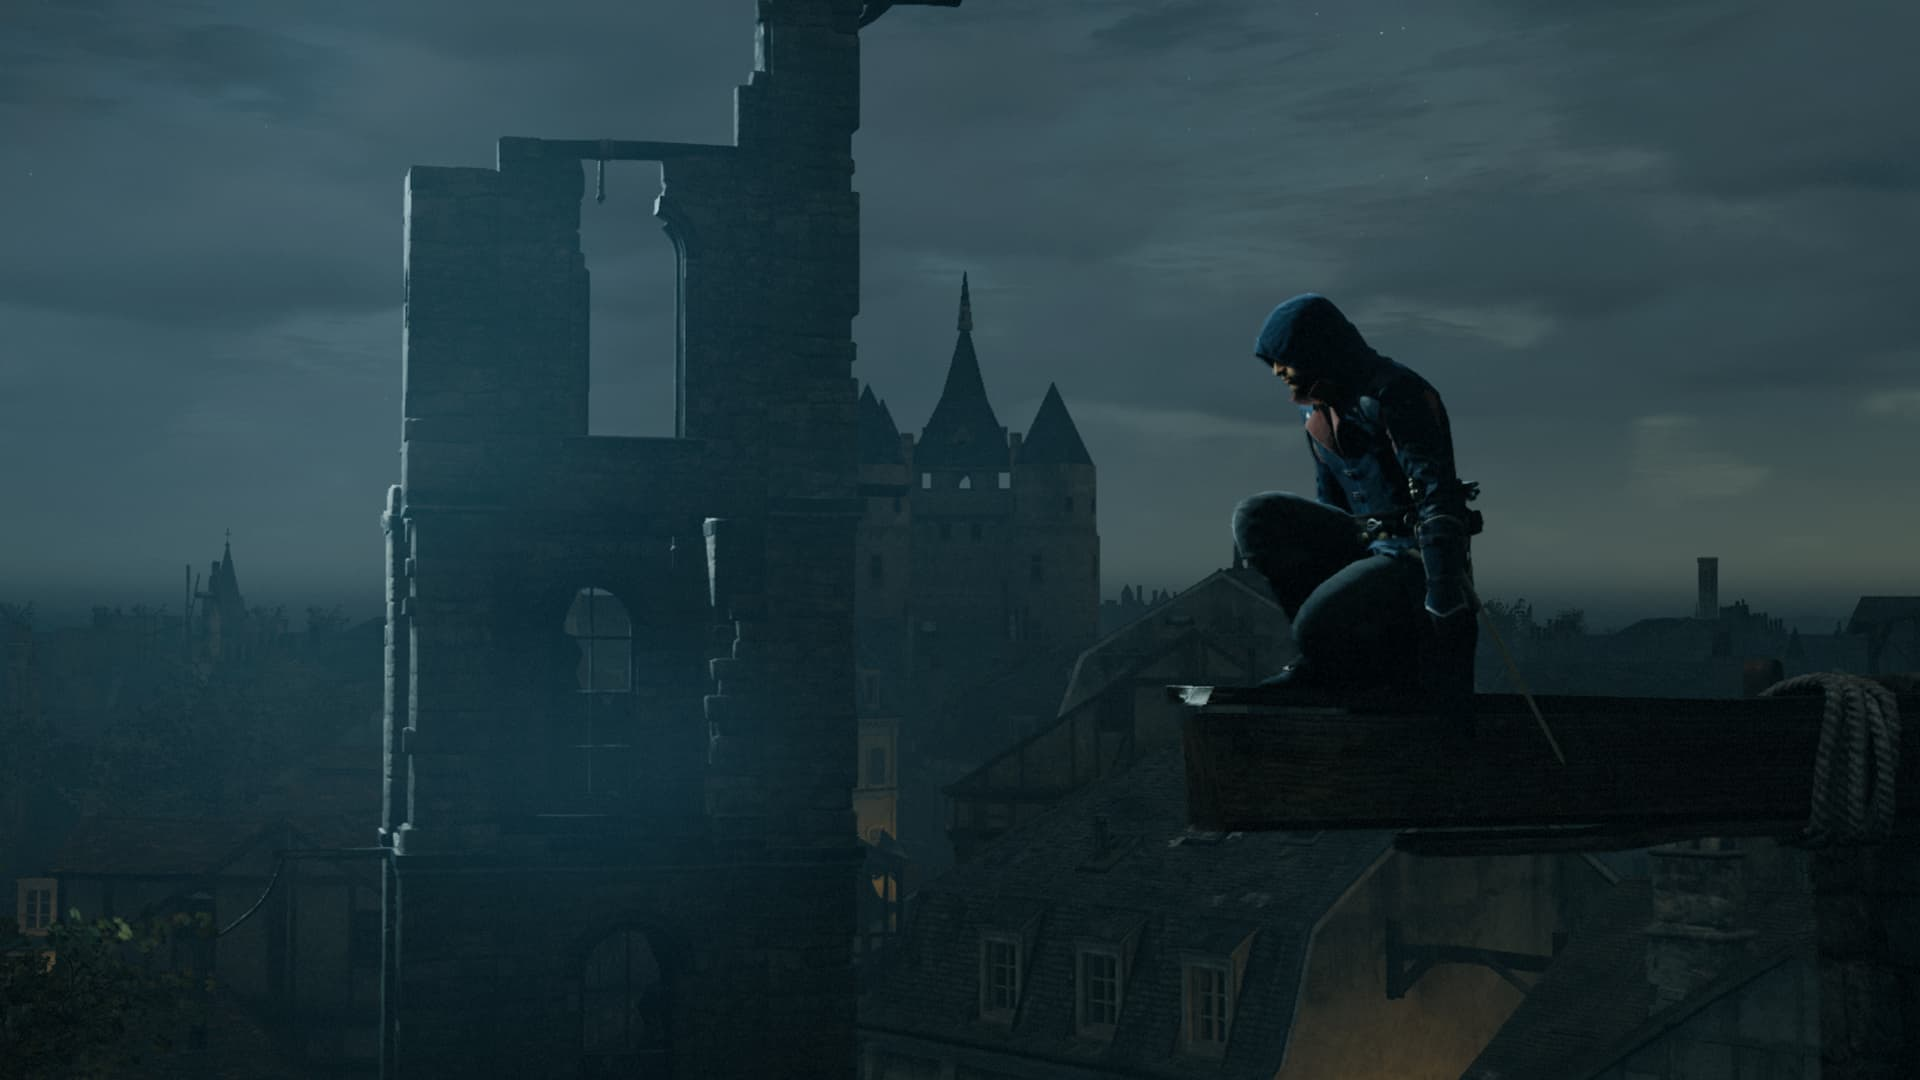 Assassin's Creed Unity: Historia de una segunda oportunidad 10